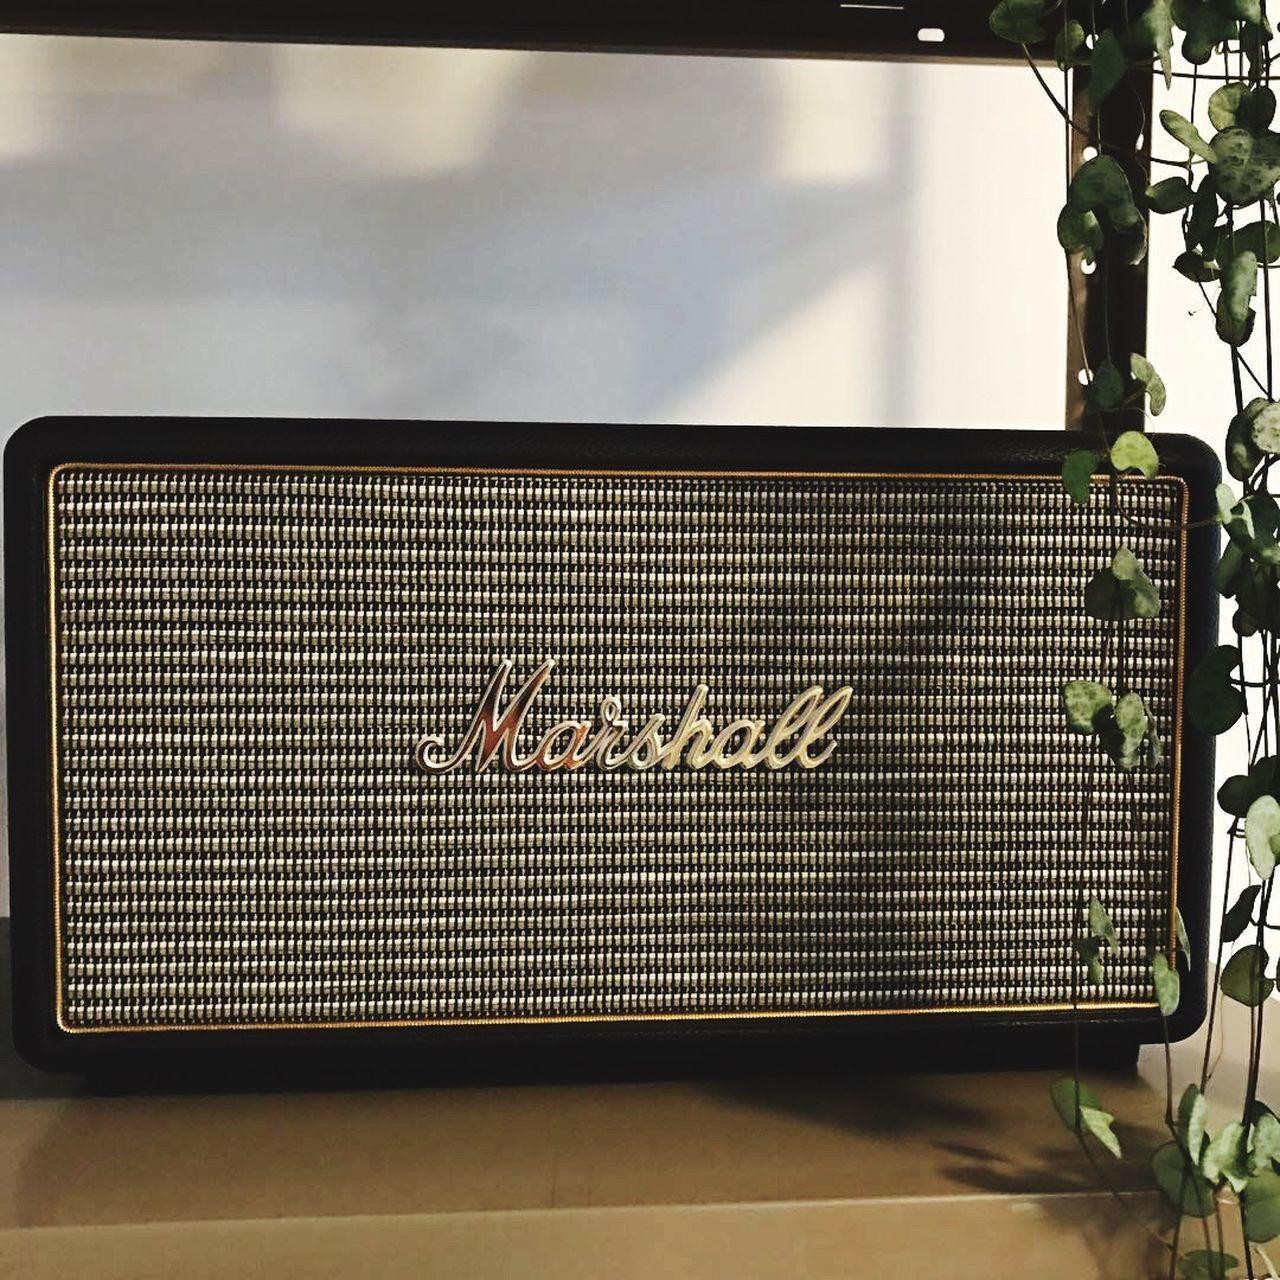 Retro Greatsounds Marshall